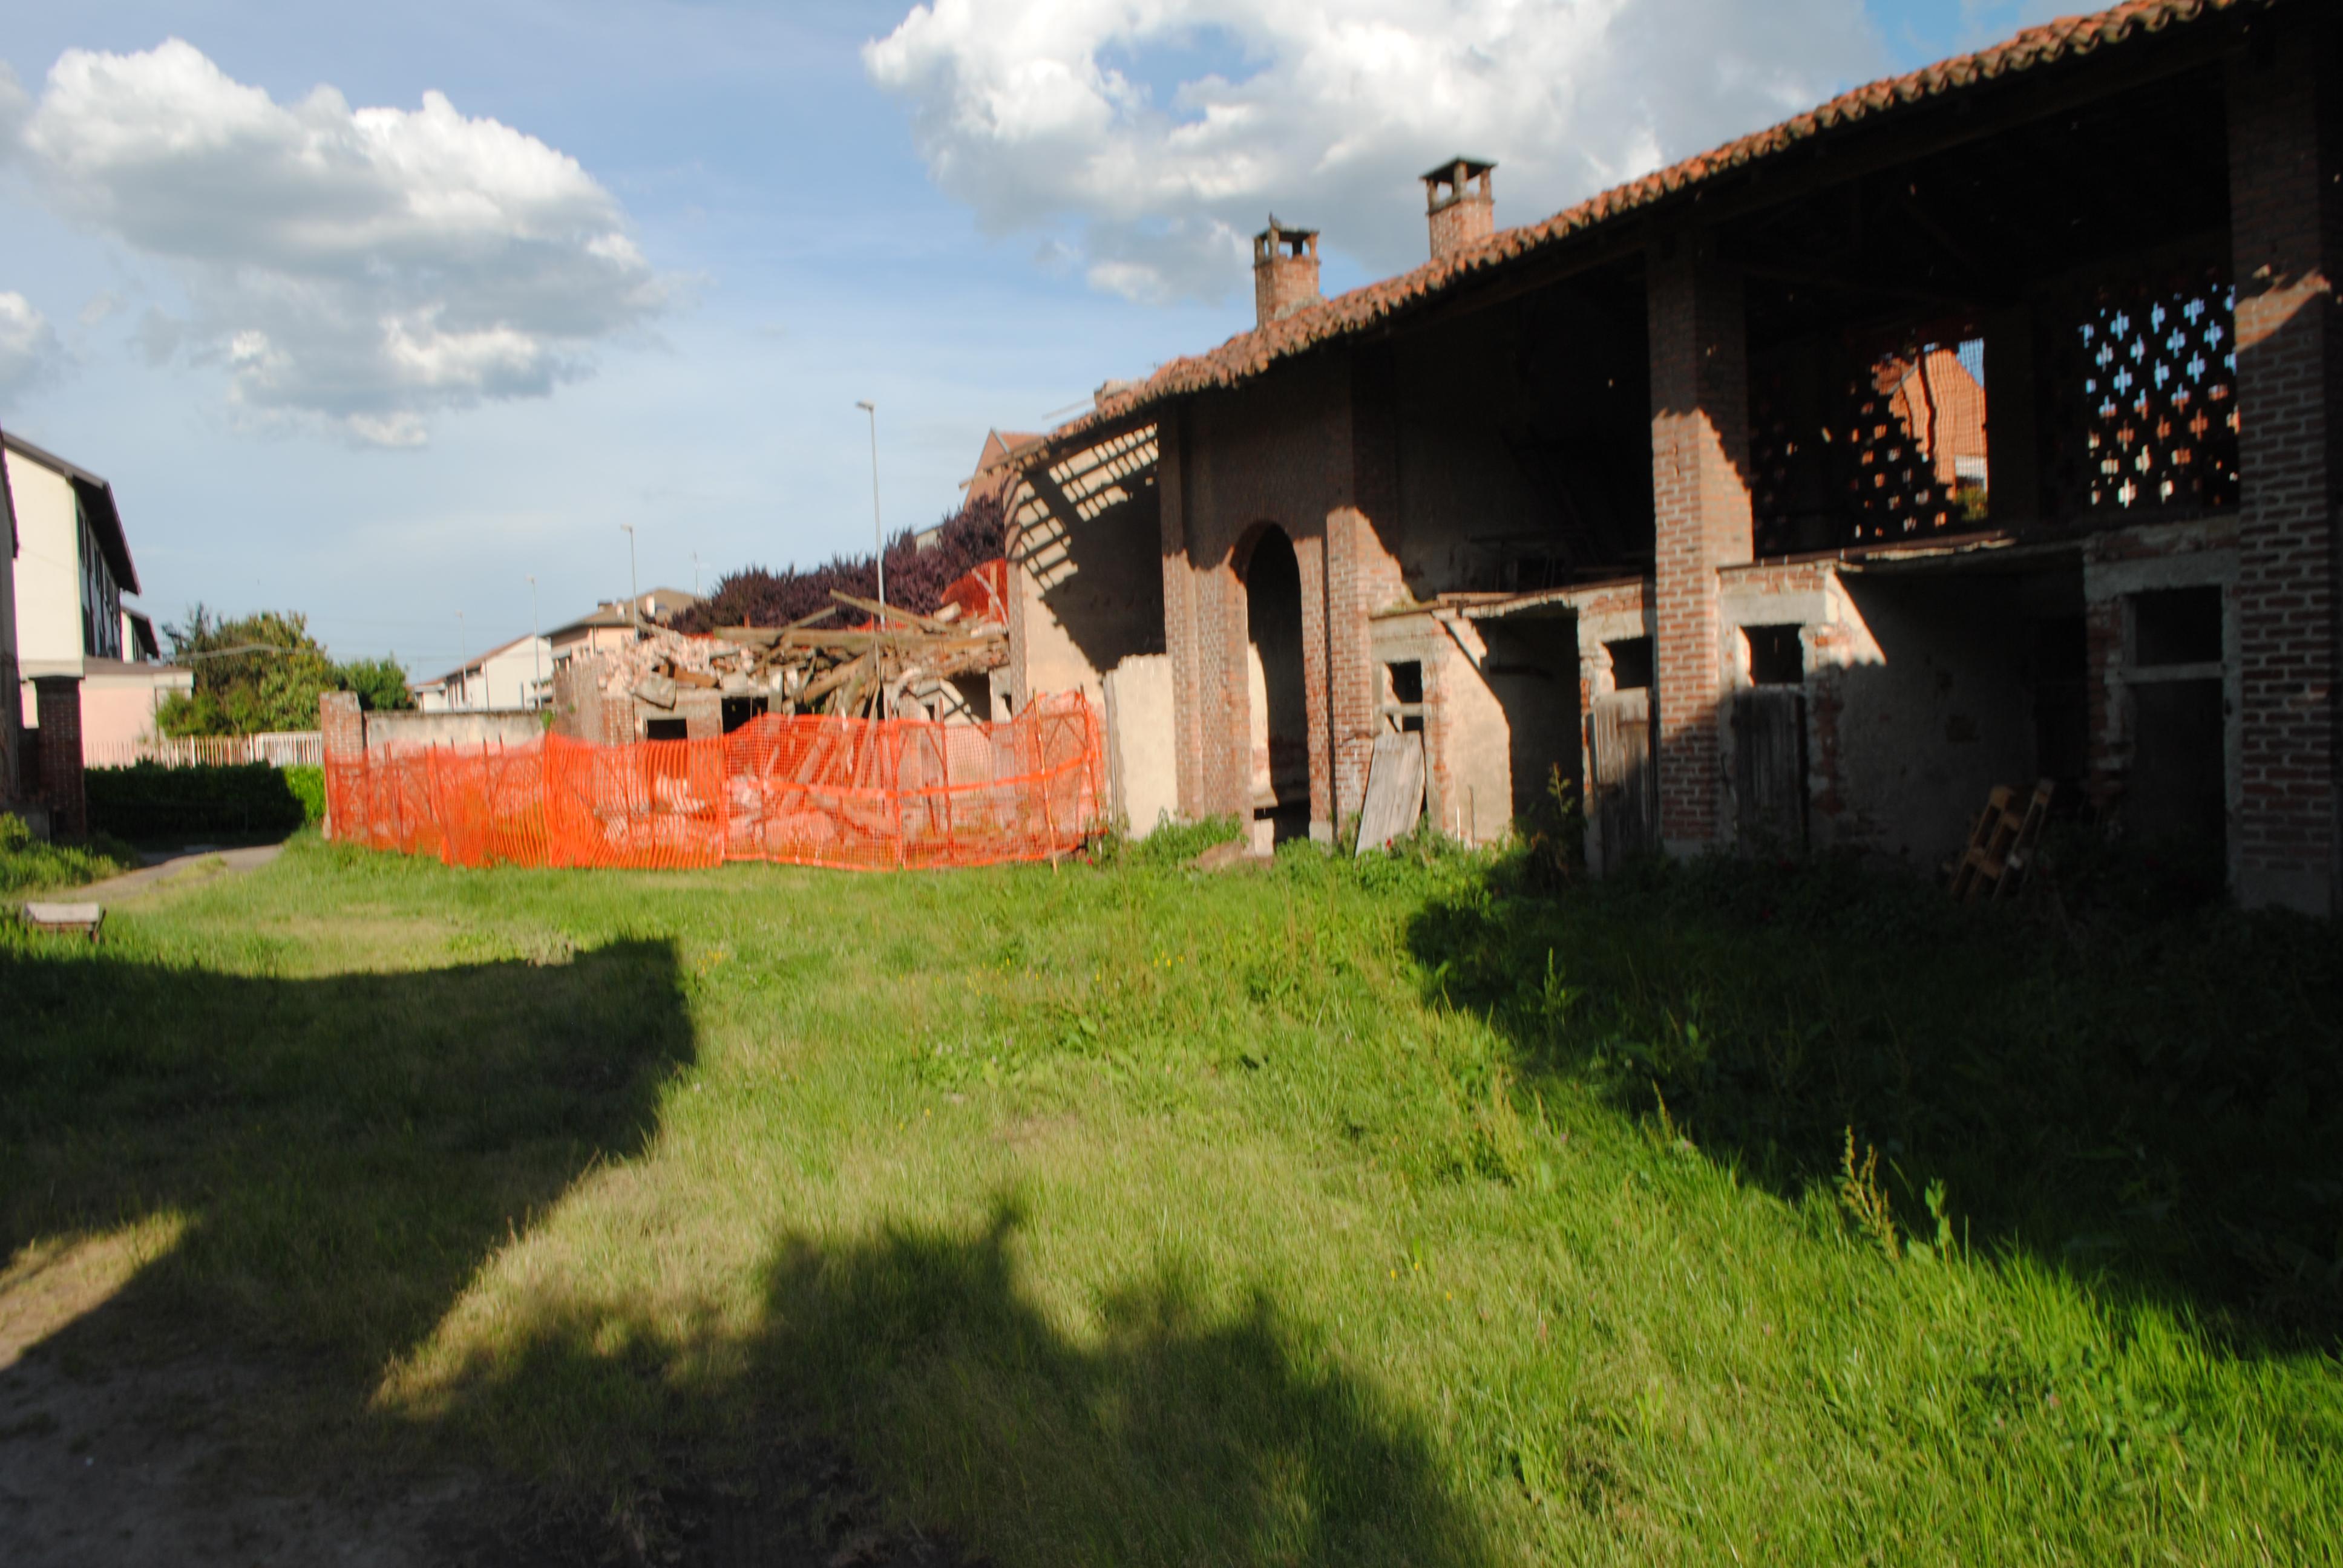 cascina Ronco San donato Mil-se Milano